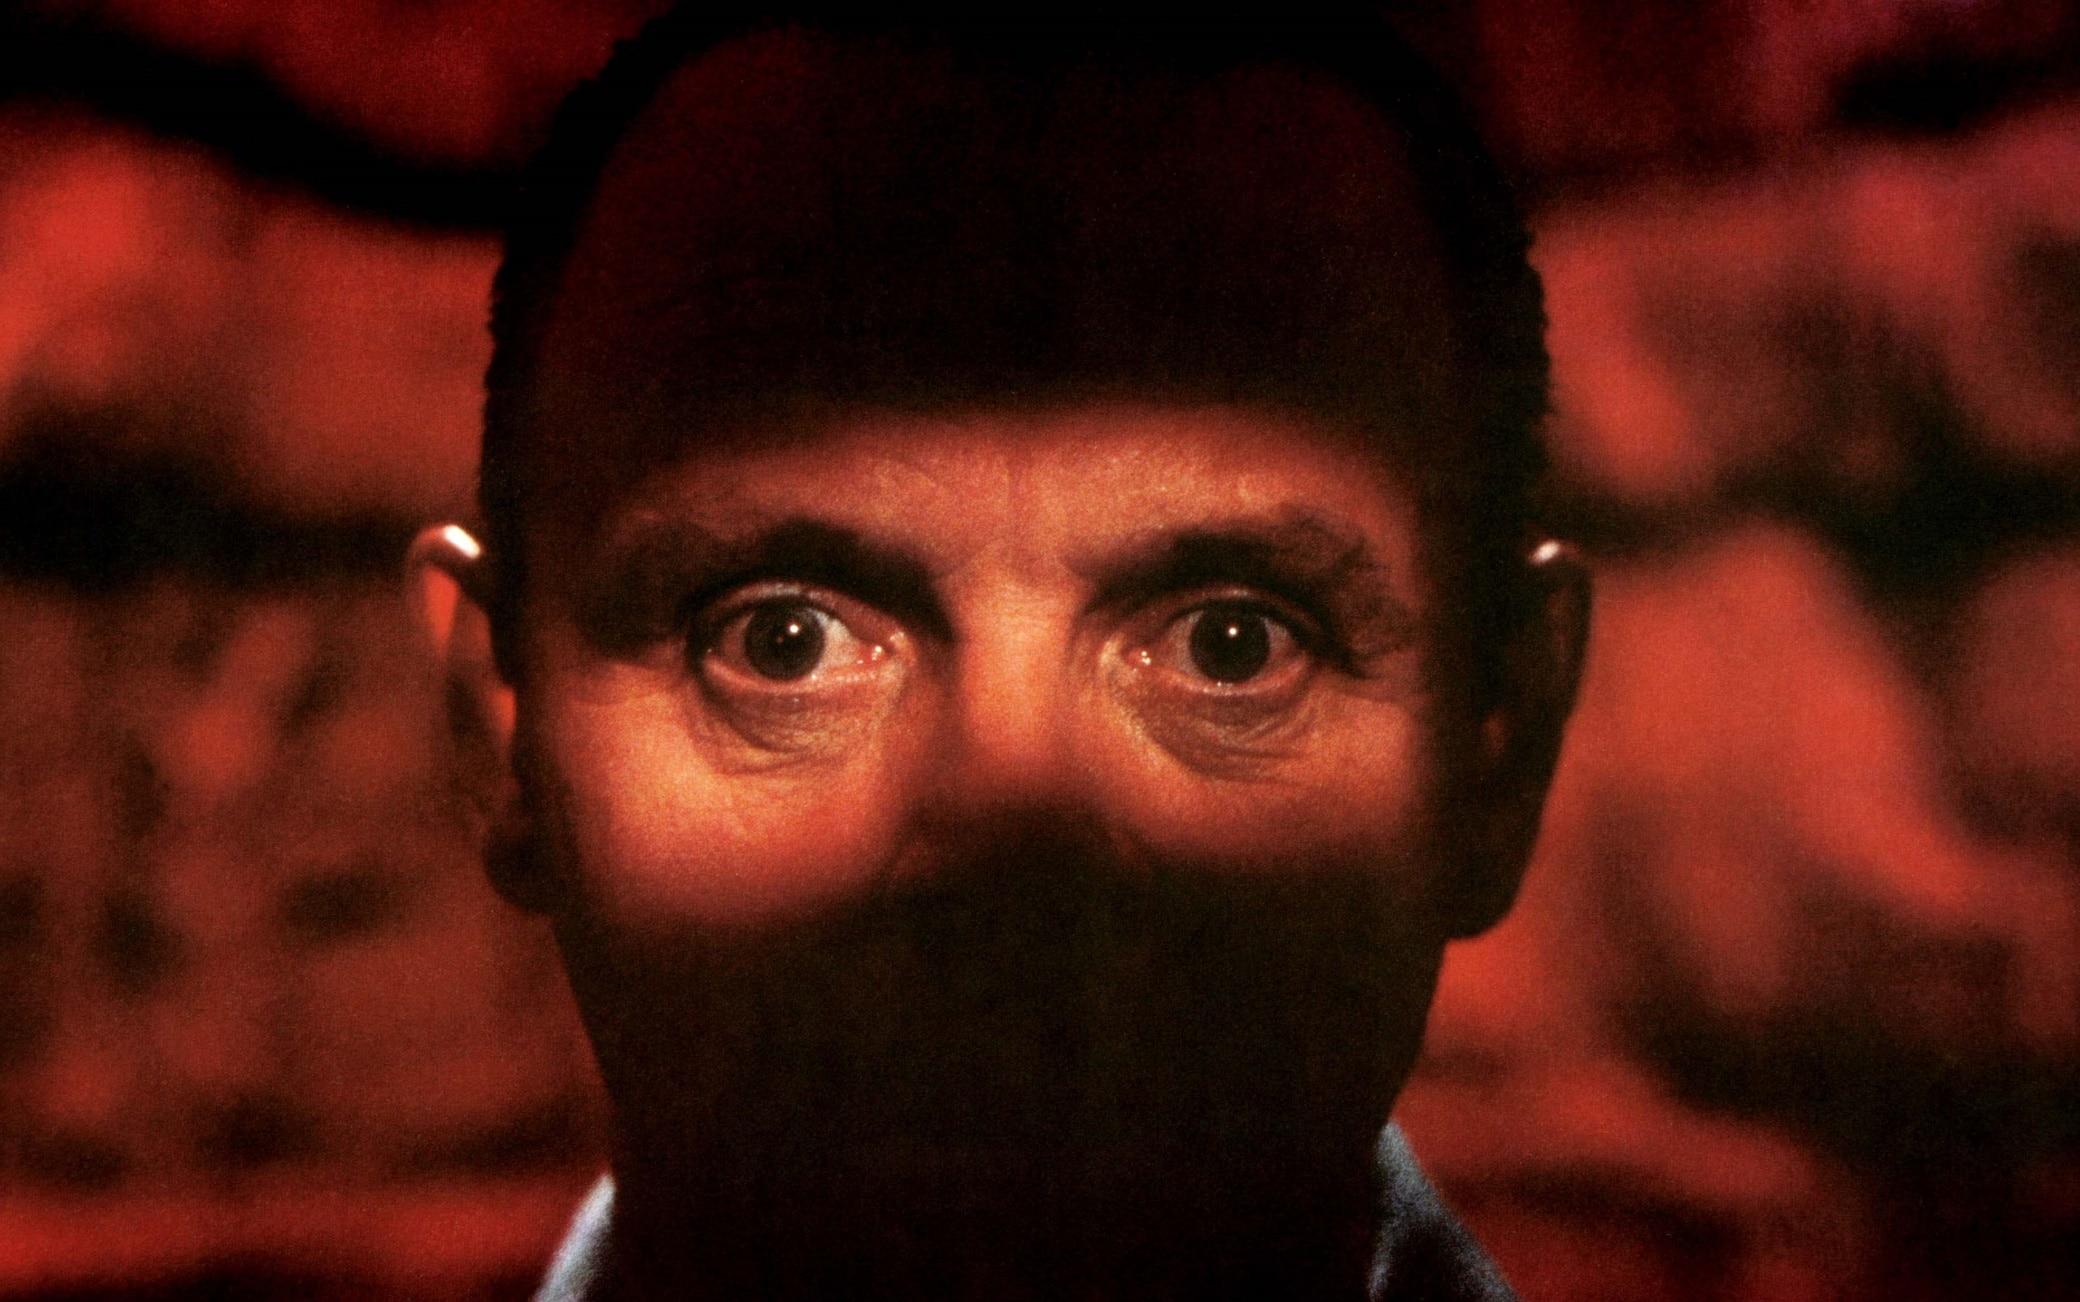 Anthony Hopkins nei panni di Hannibal Lecter